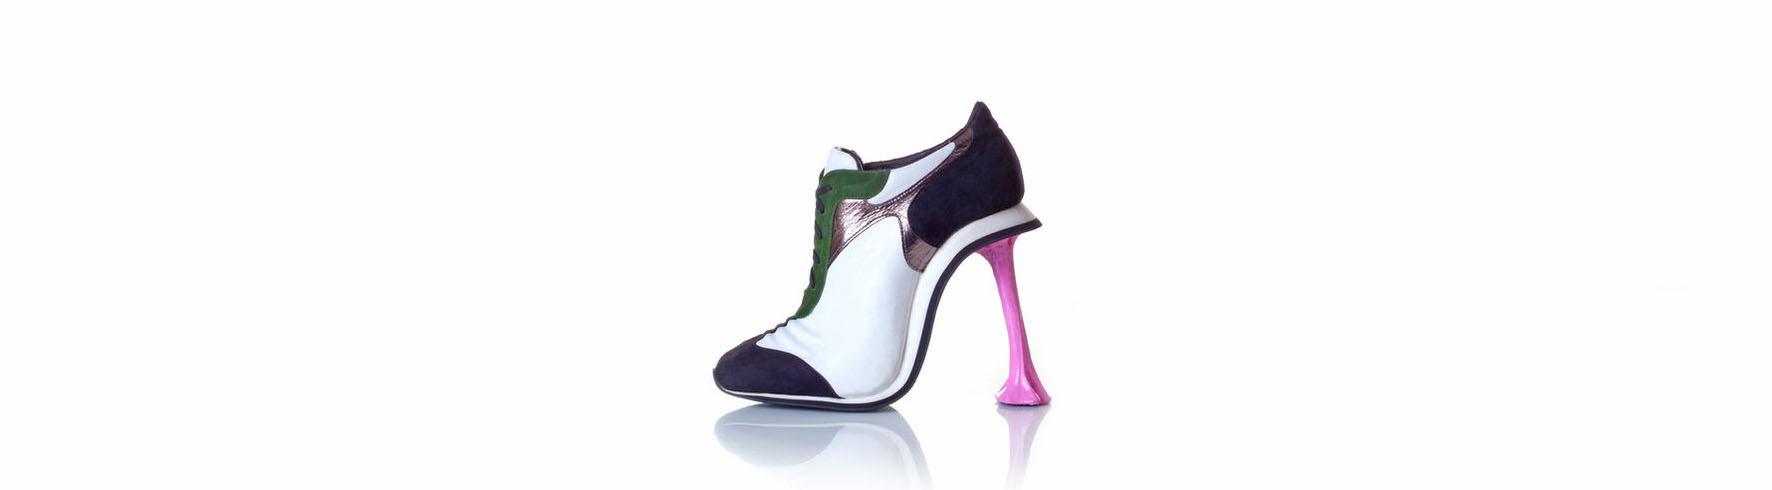 kobi levi et les chaussures sculptures figures de style. Black Bedroom Furniture Sets. Home Design Ideas